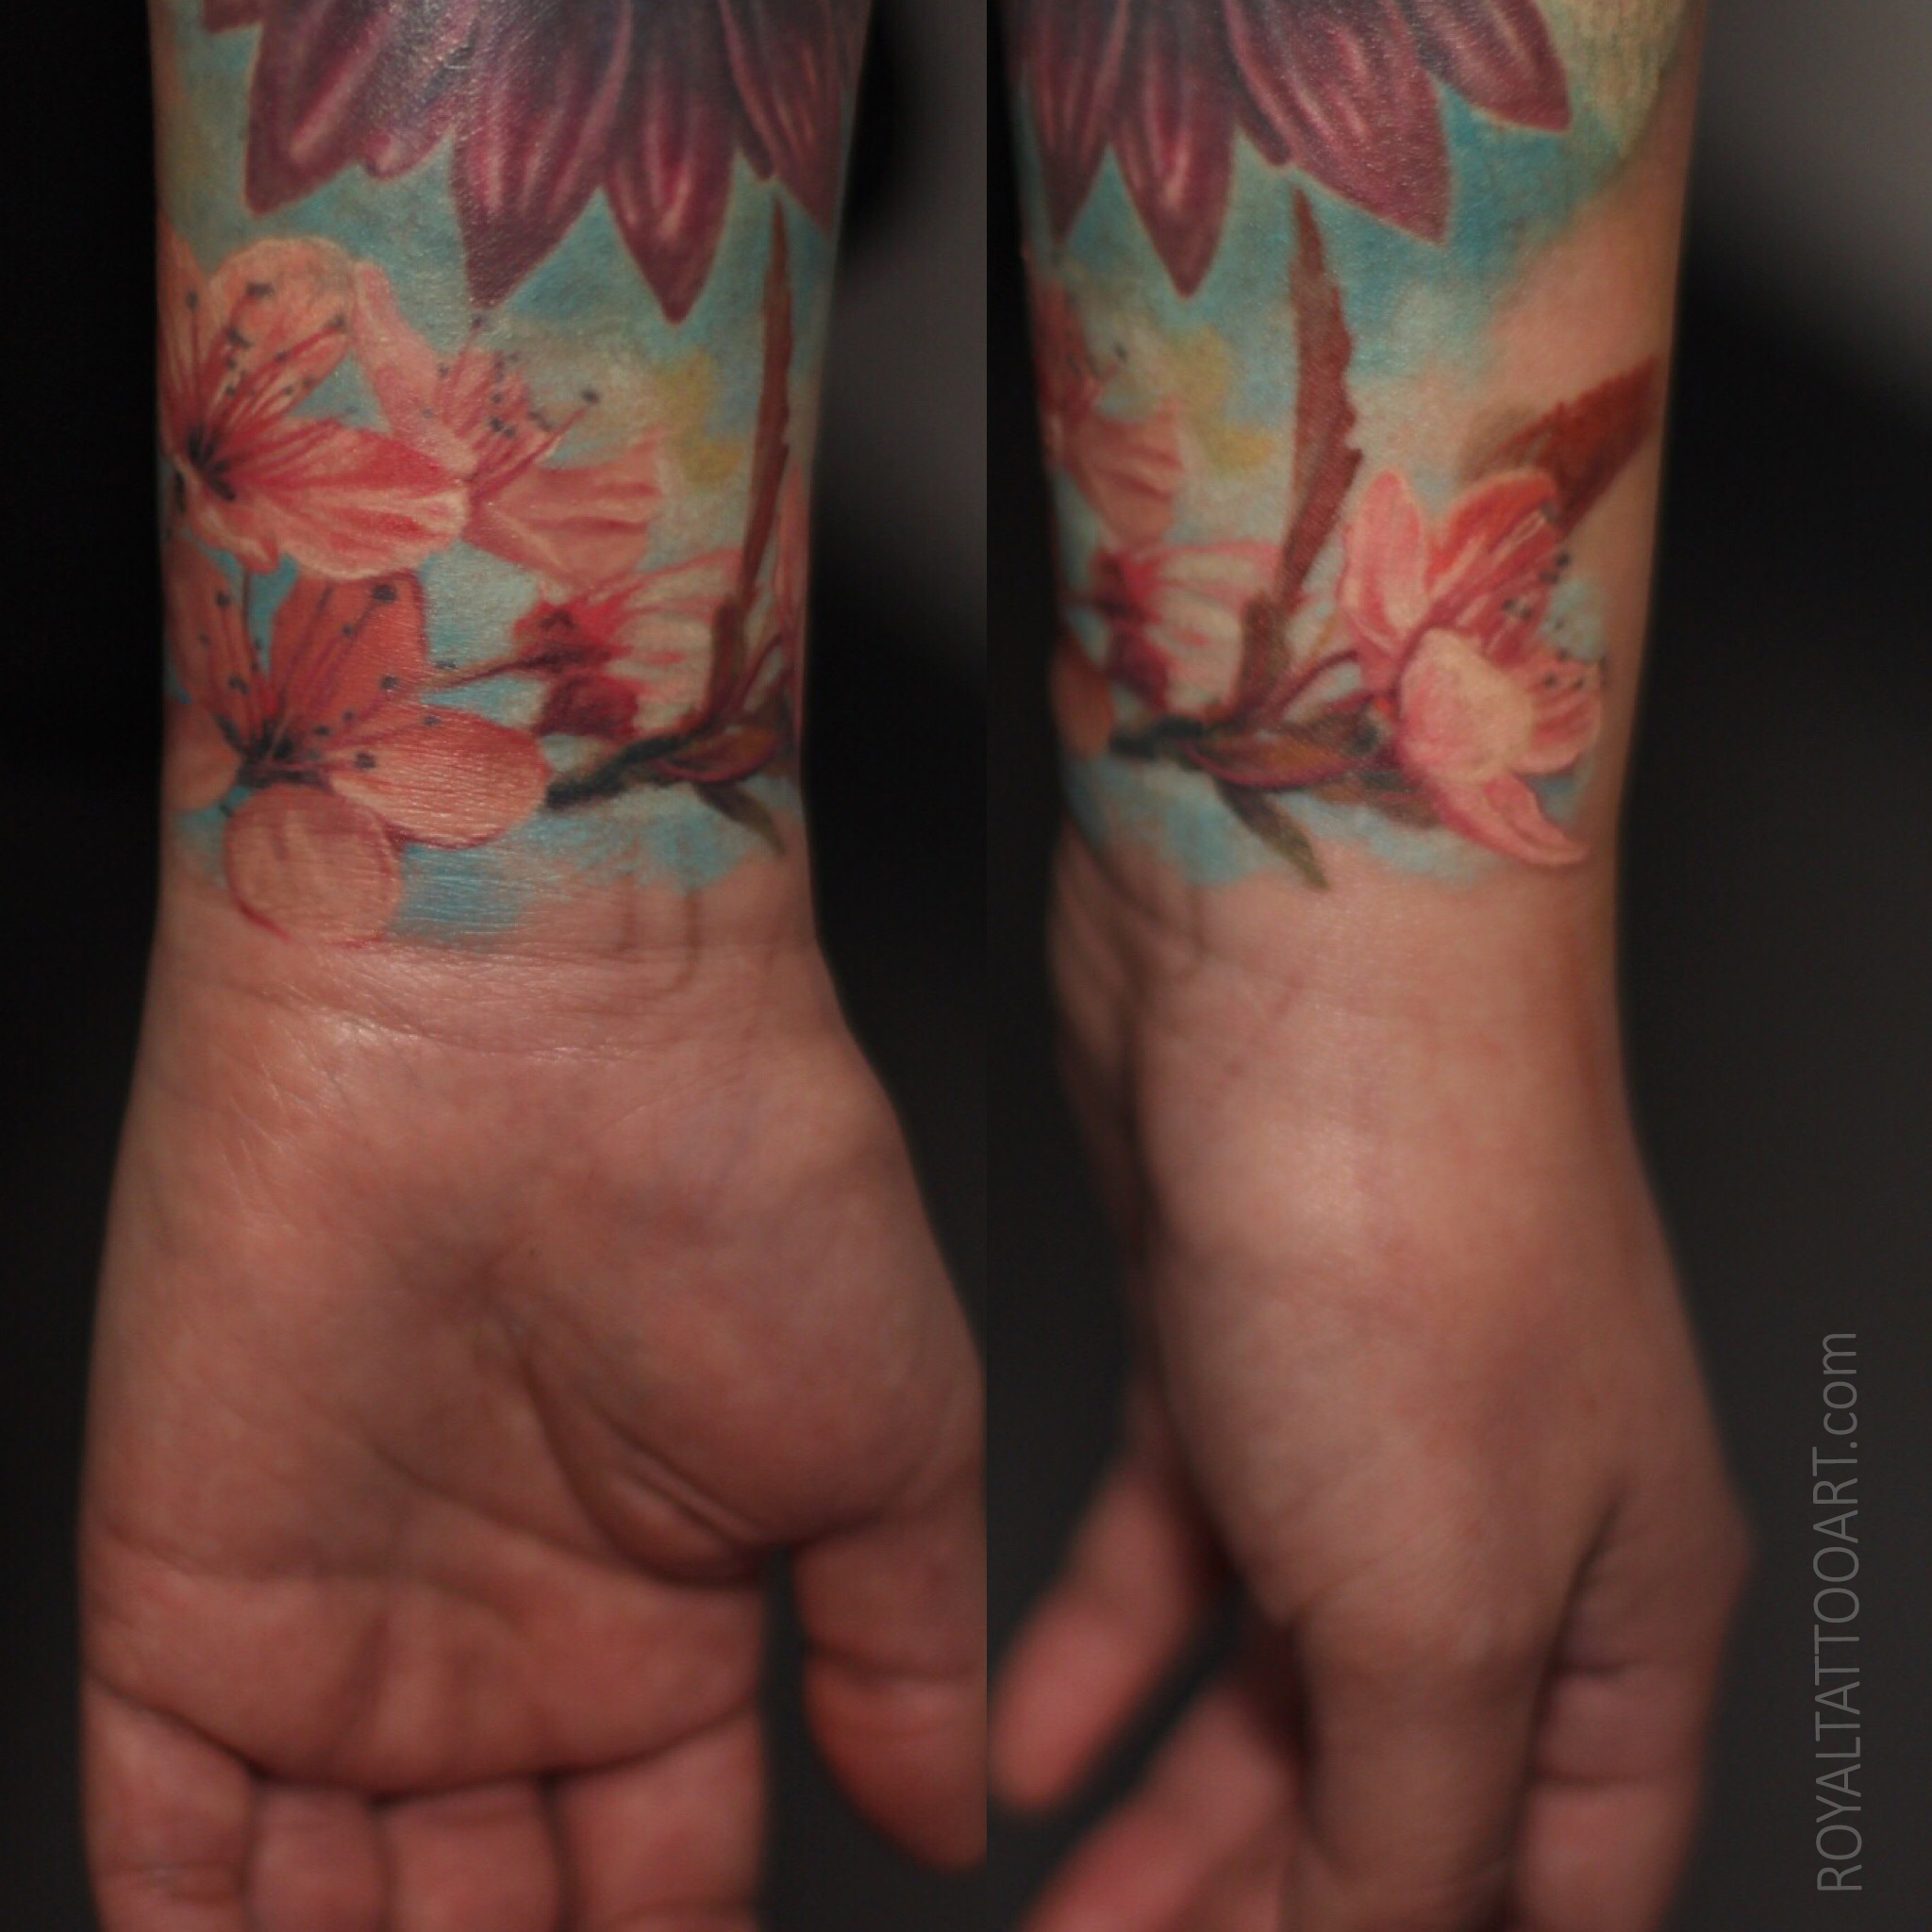 nyc new york ny color realistic cherry blossom flower tattoo ink pink wrist female girl artist costum tattooer